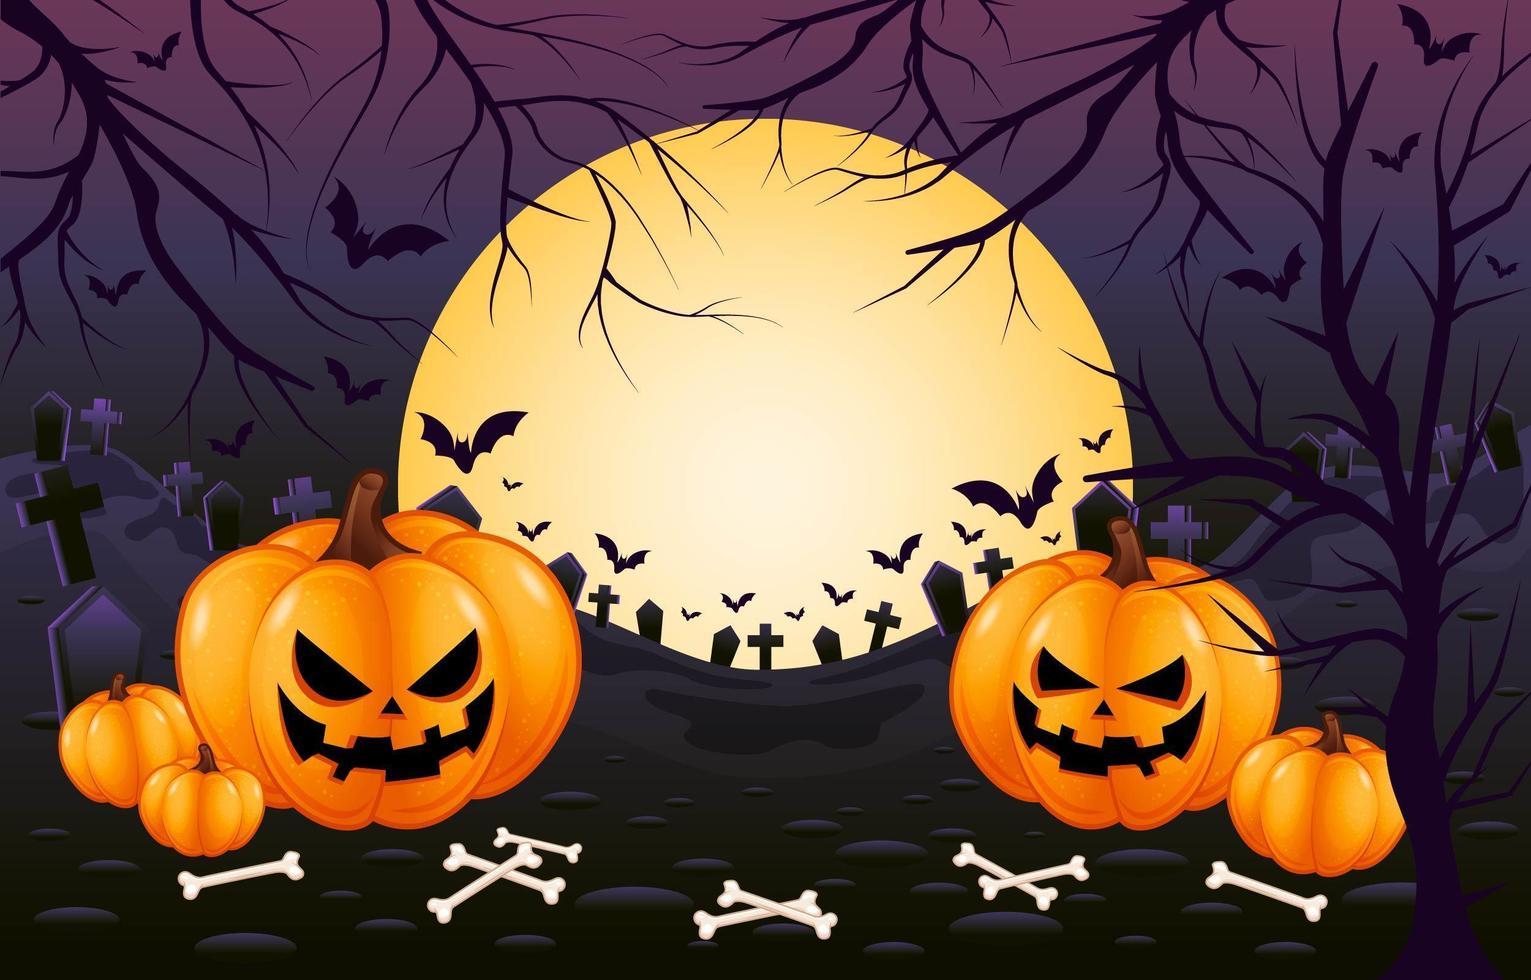 horror y espeluznante cementerio púrpura fondo de halloween vector